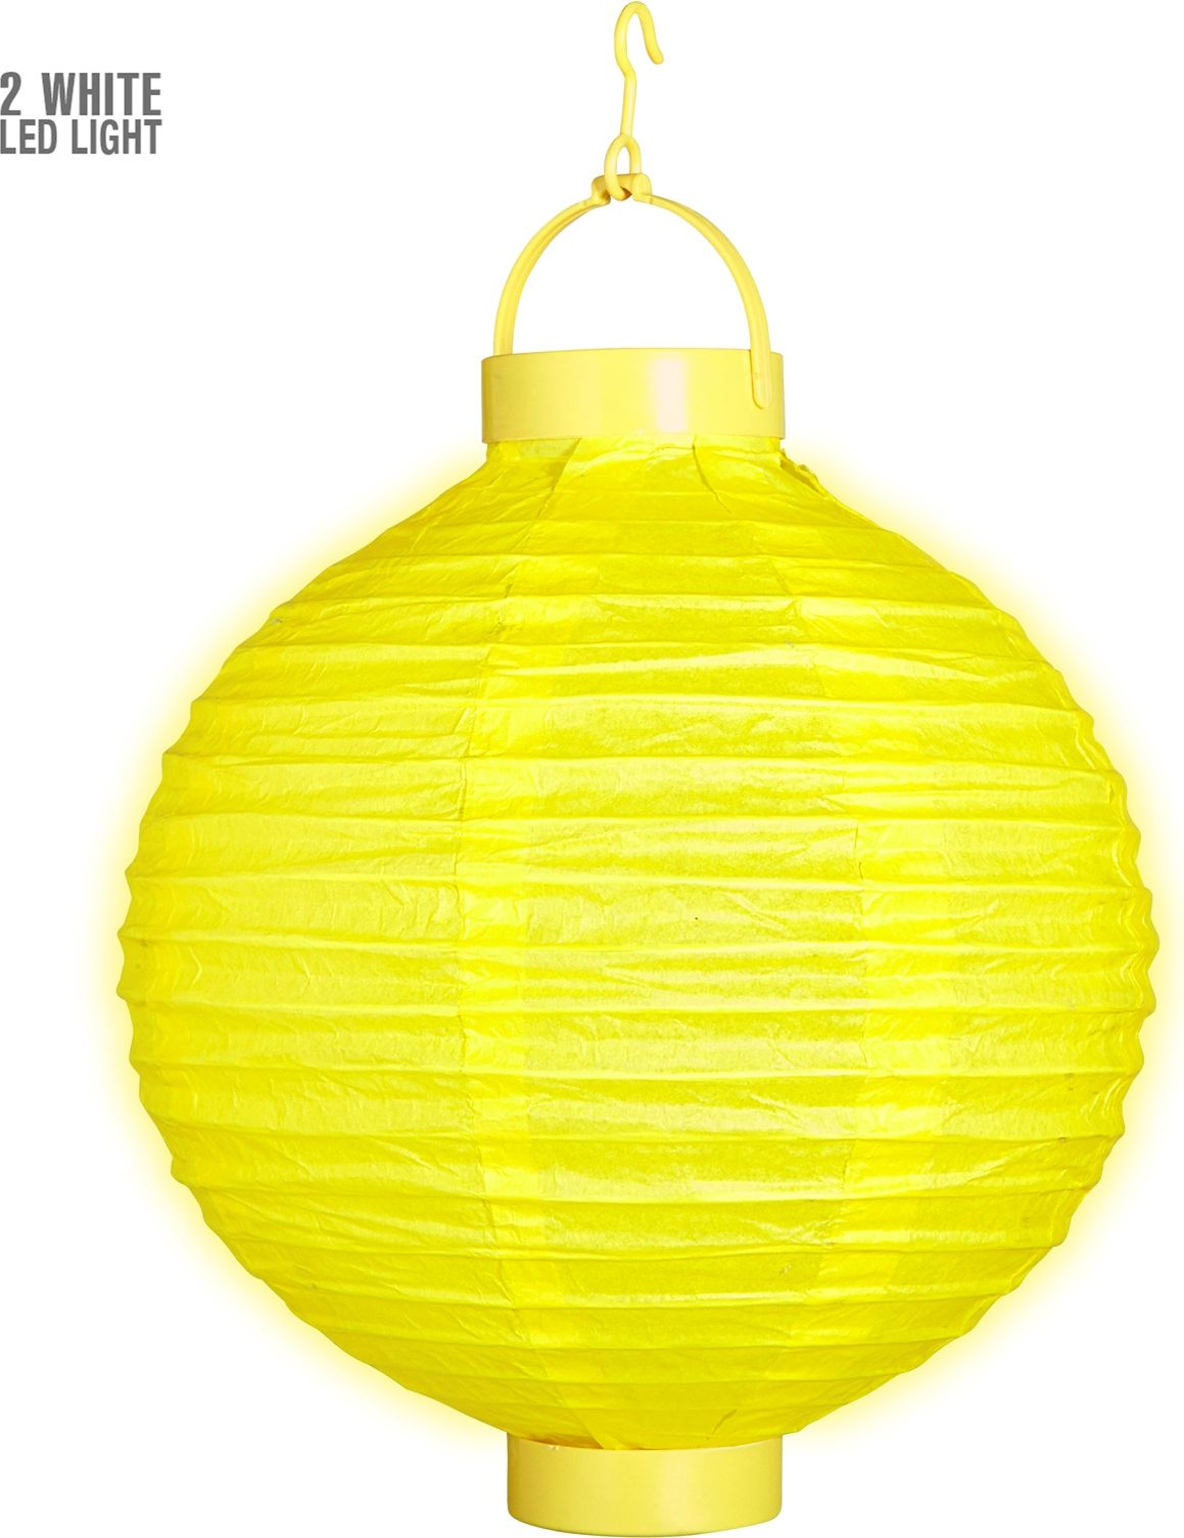 Gele lantaarn met 2 witte LED lichten